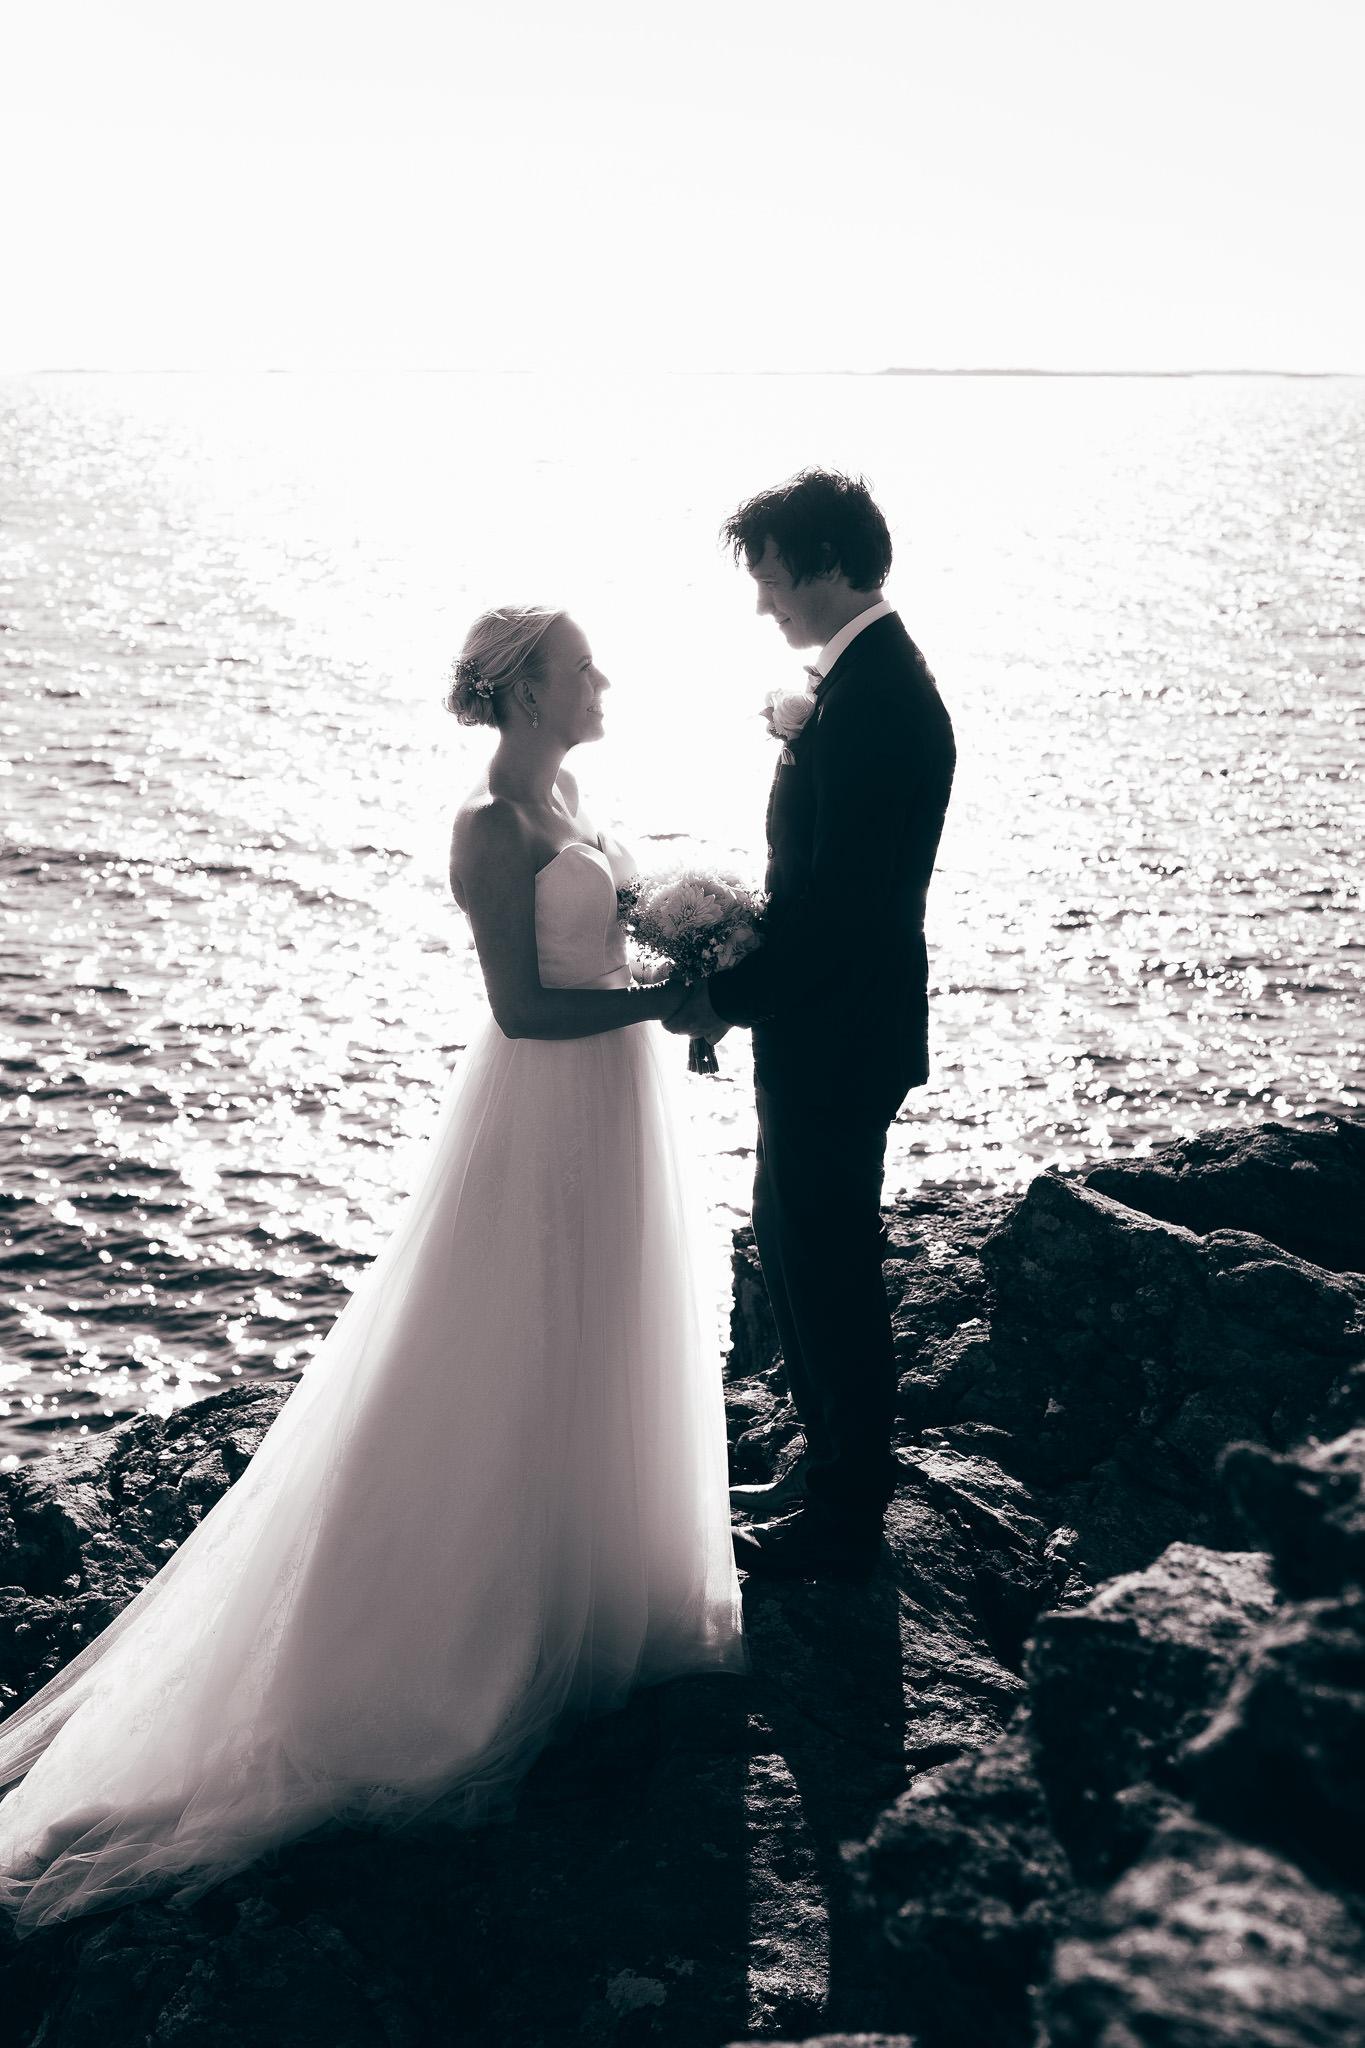 Wedding+Photographer+Norway+Bryllupsfotograf+Casey+Arneson+JT-132.jpg